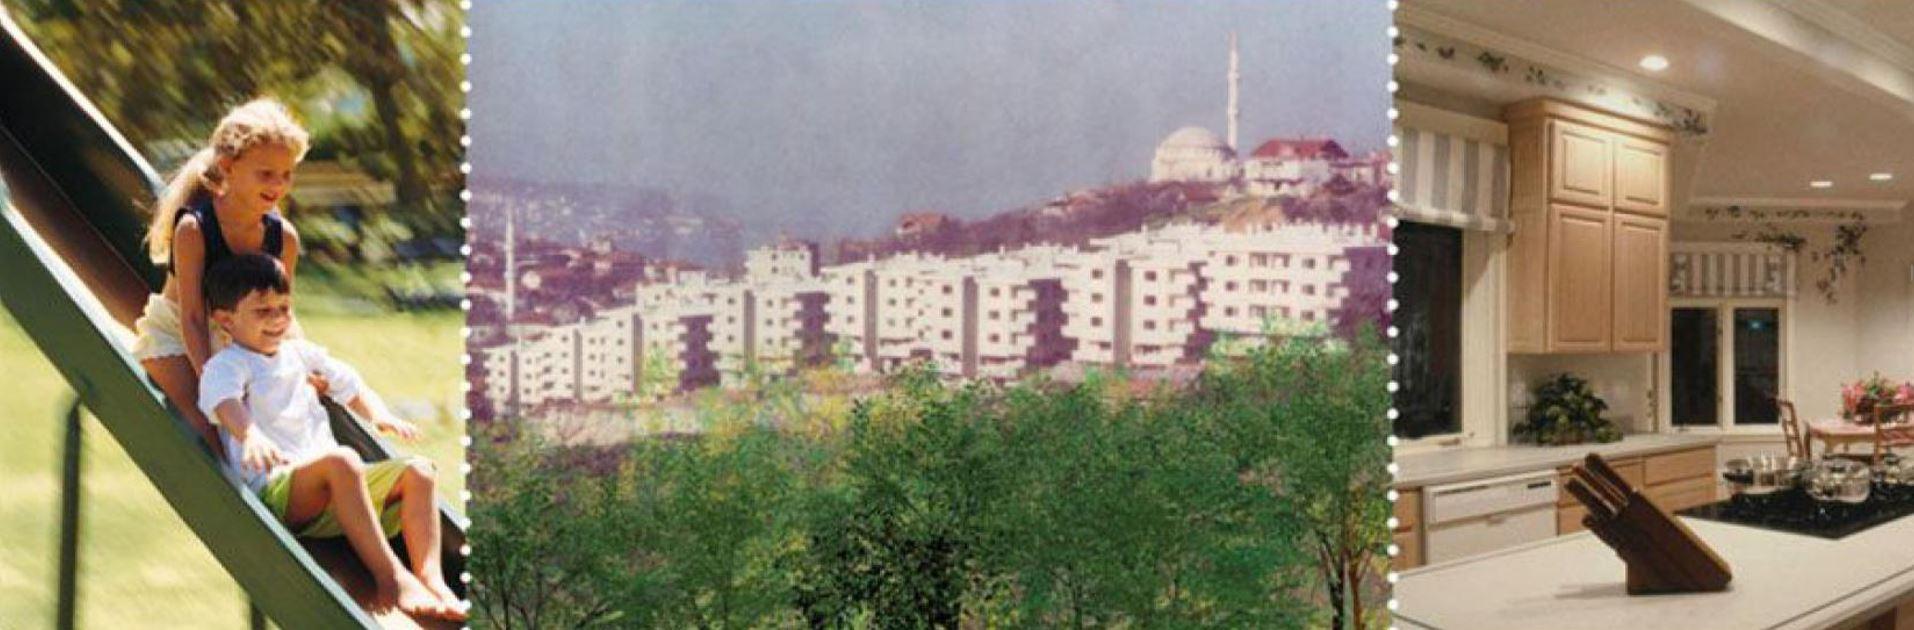 İstanbul Çubuklu 110 Konutluk Fatih Sitesi